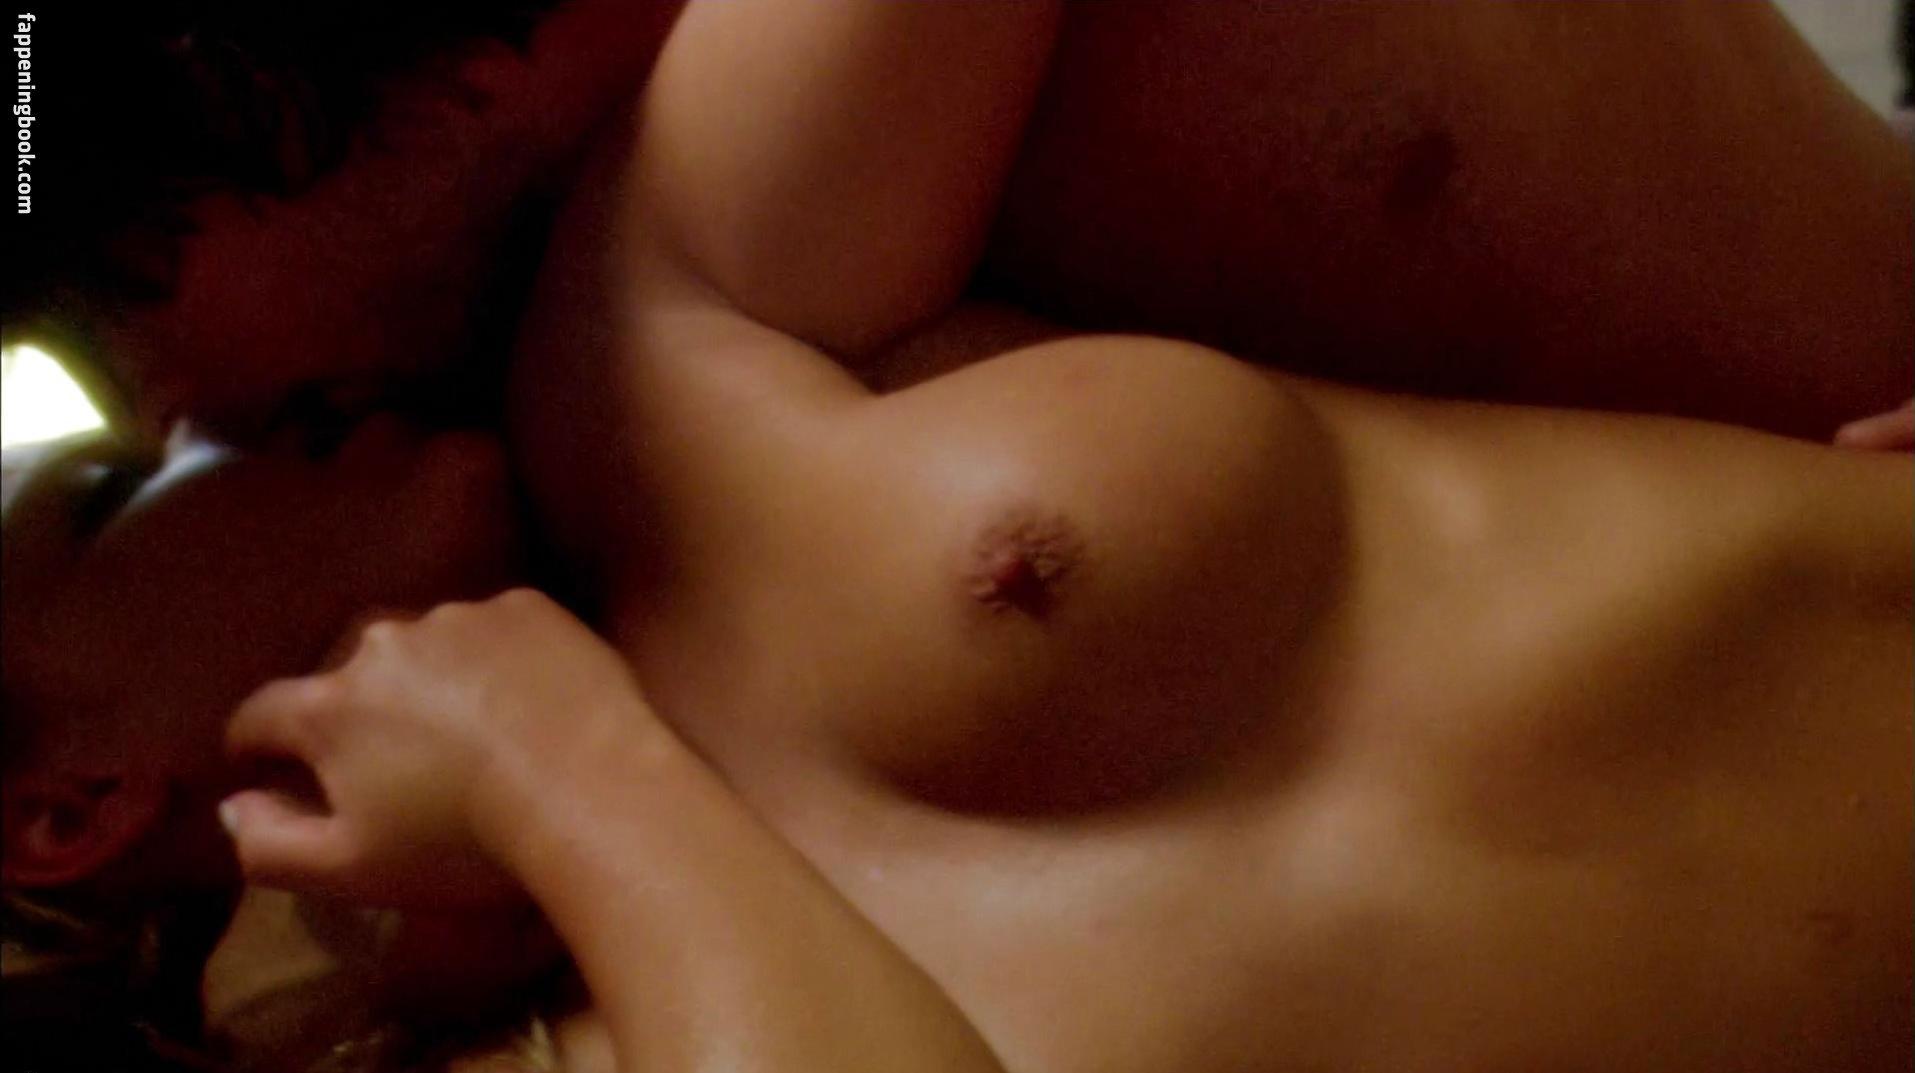 Erotic traveler naked pearls